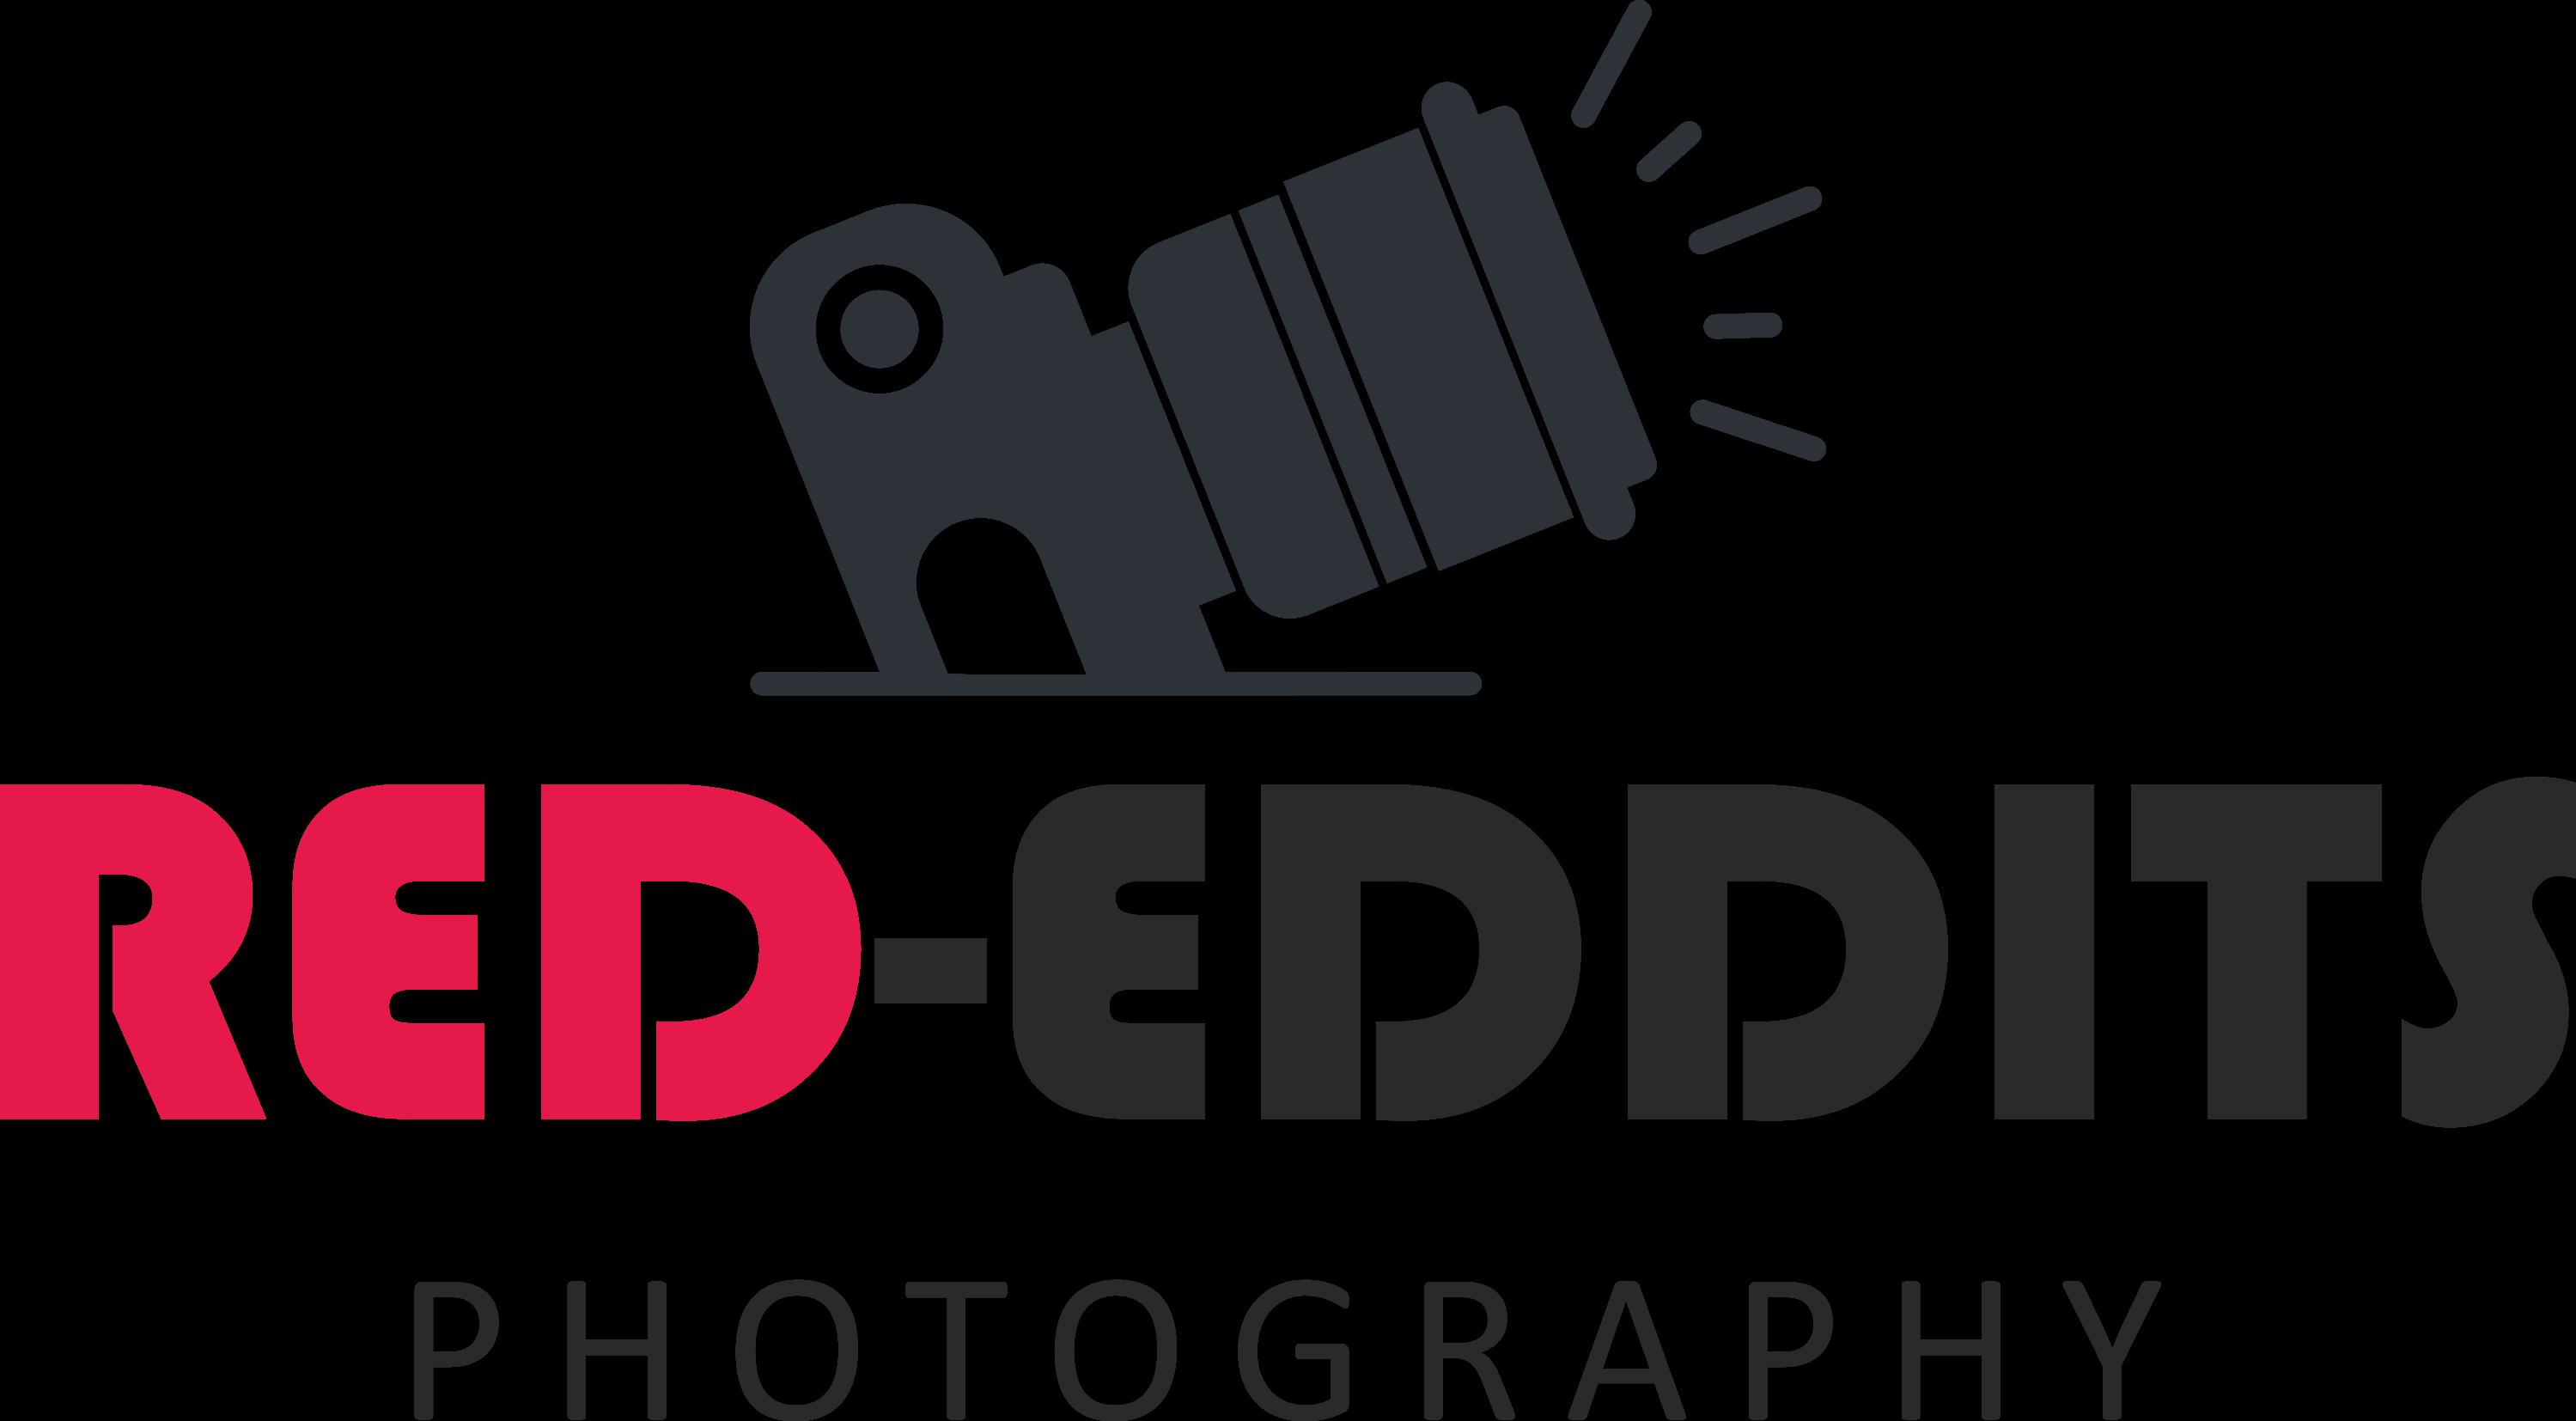 RED-EDDITS PHOTOGRAPHY